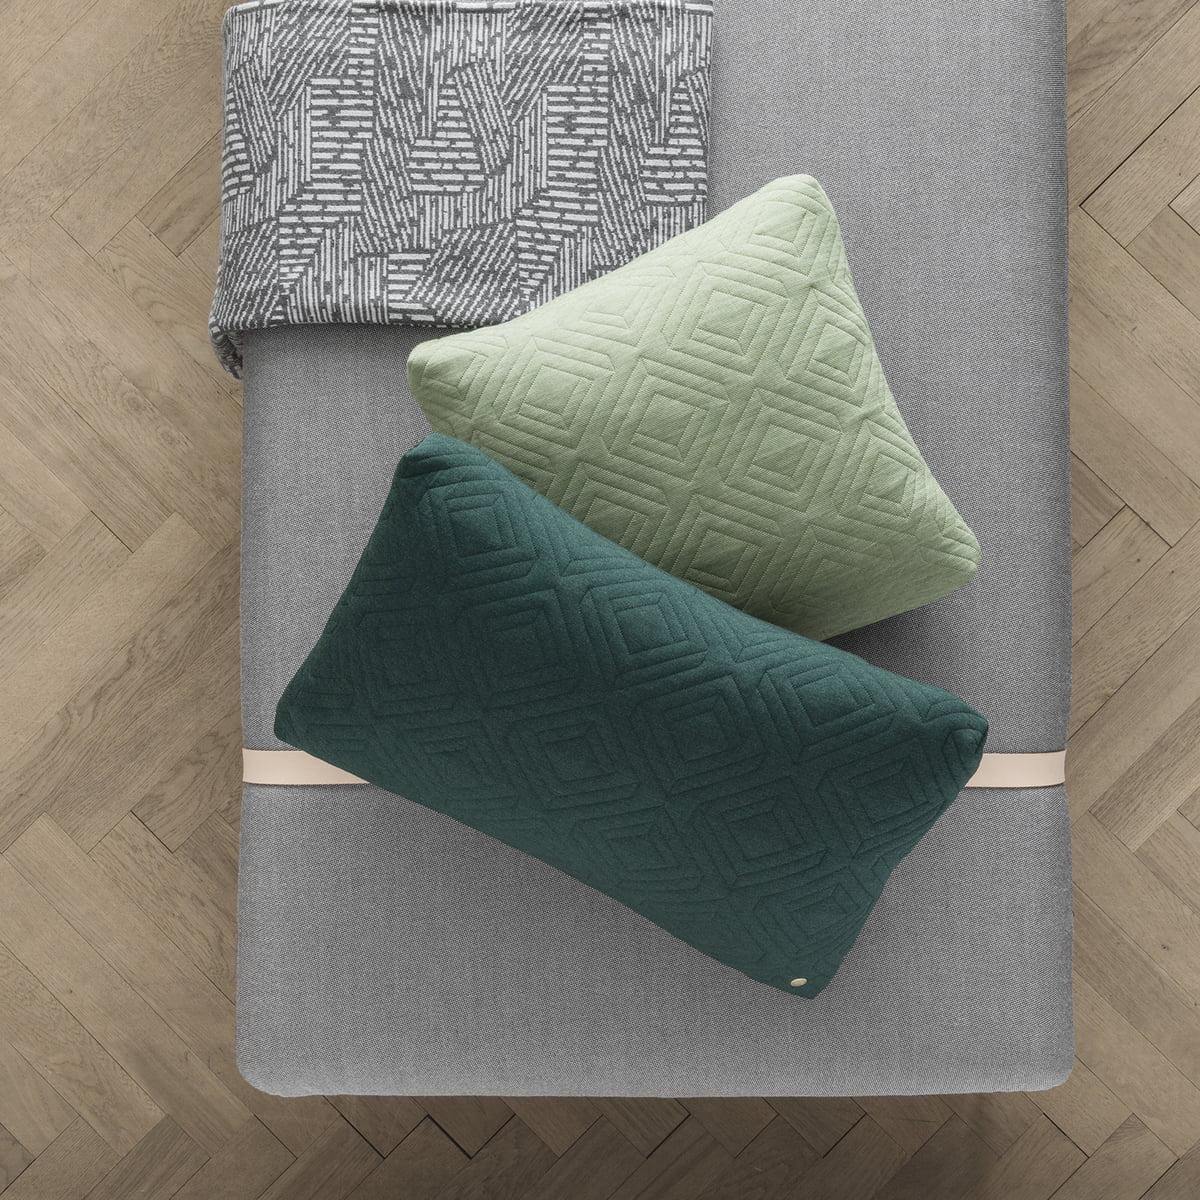 quilt kissen 80 x 50 cm von ferm living bei. Black Bedroom Furniture Sets. Home Design Ideas